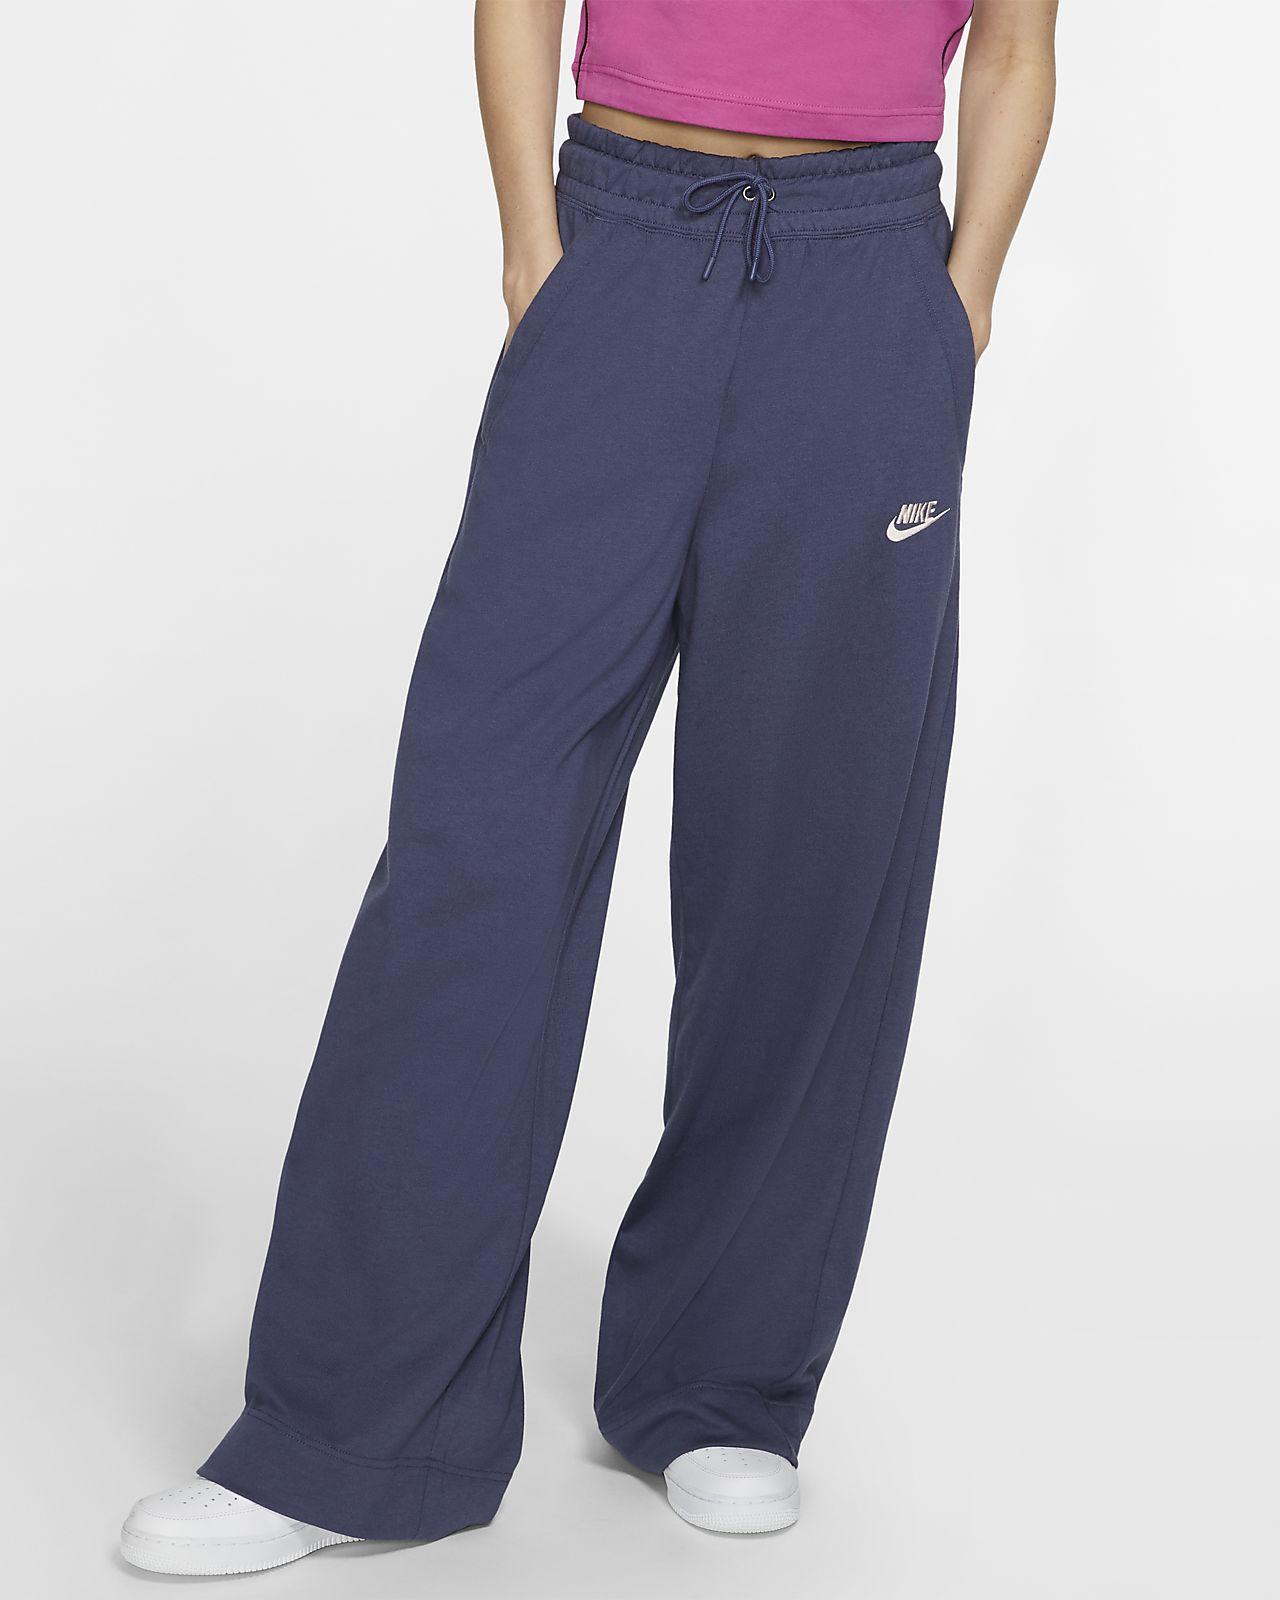 Nike Sportswear női dzsörzénadrág